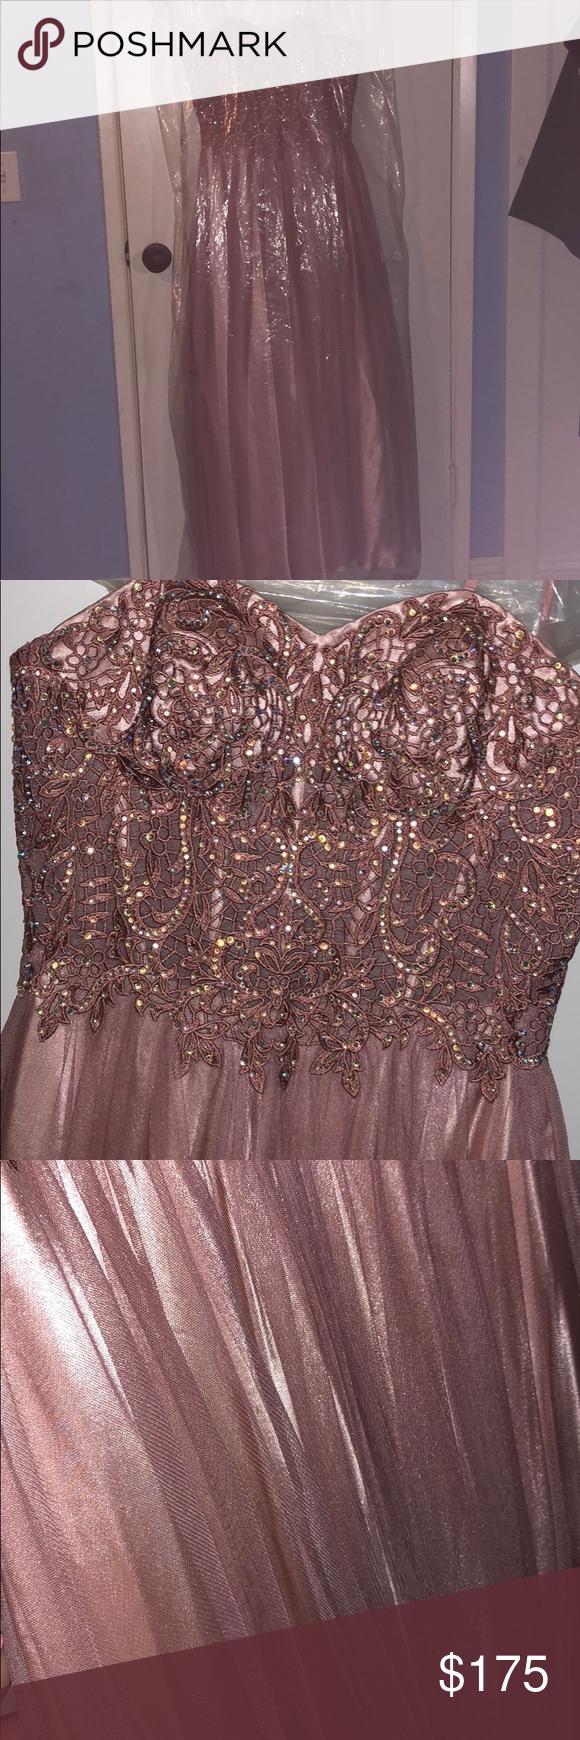 Blondie nites pink prom dress my posh picks pinterest blondies